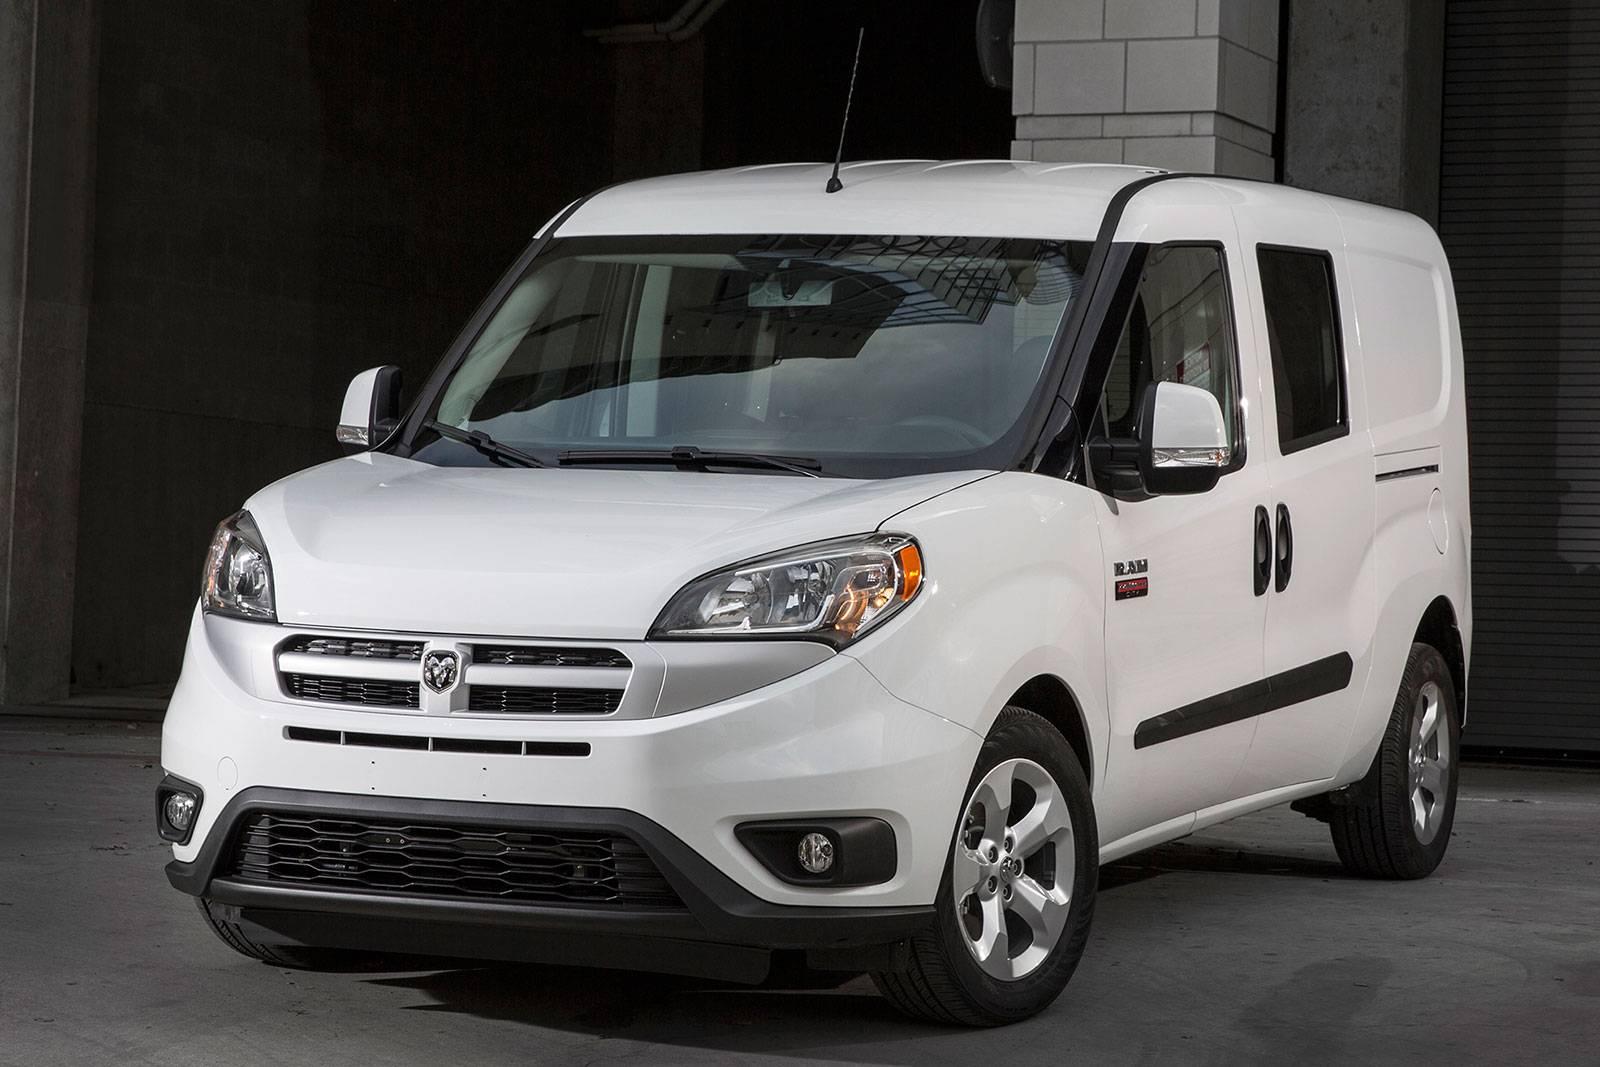 2017 ram promaster city cargo minivan tradesman slt cargo fq oem 1 1600